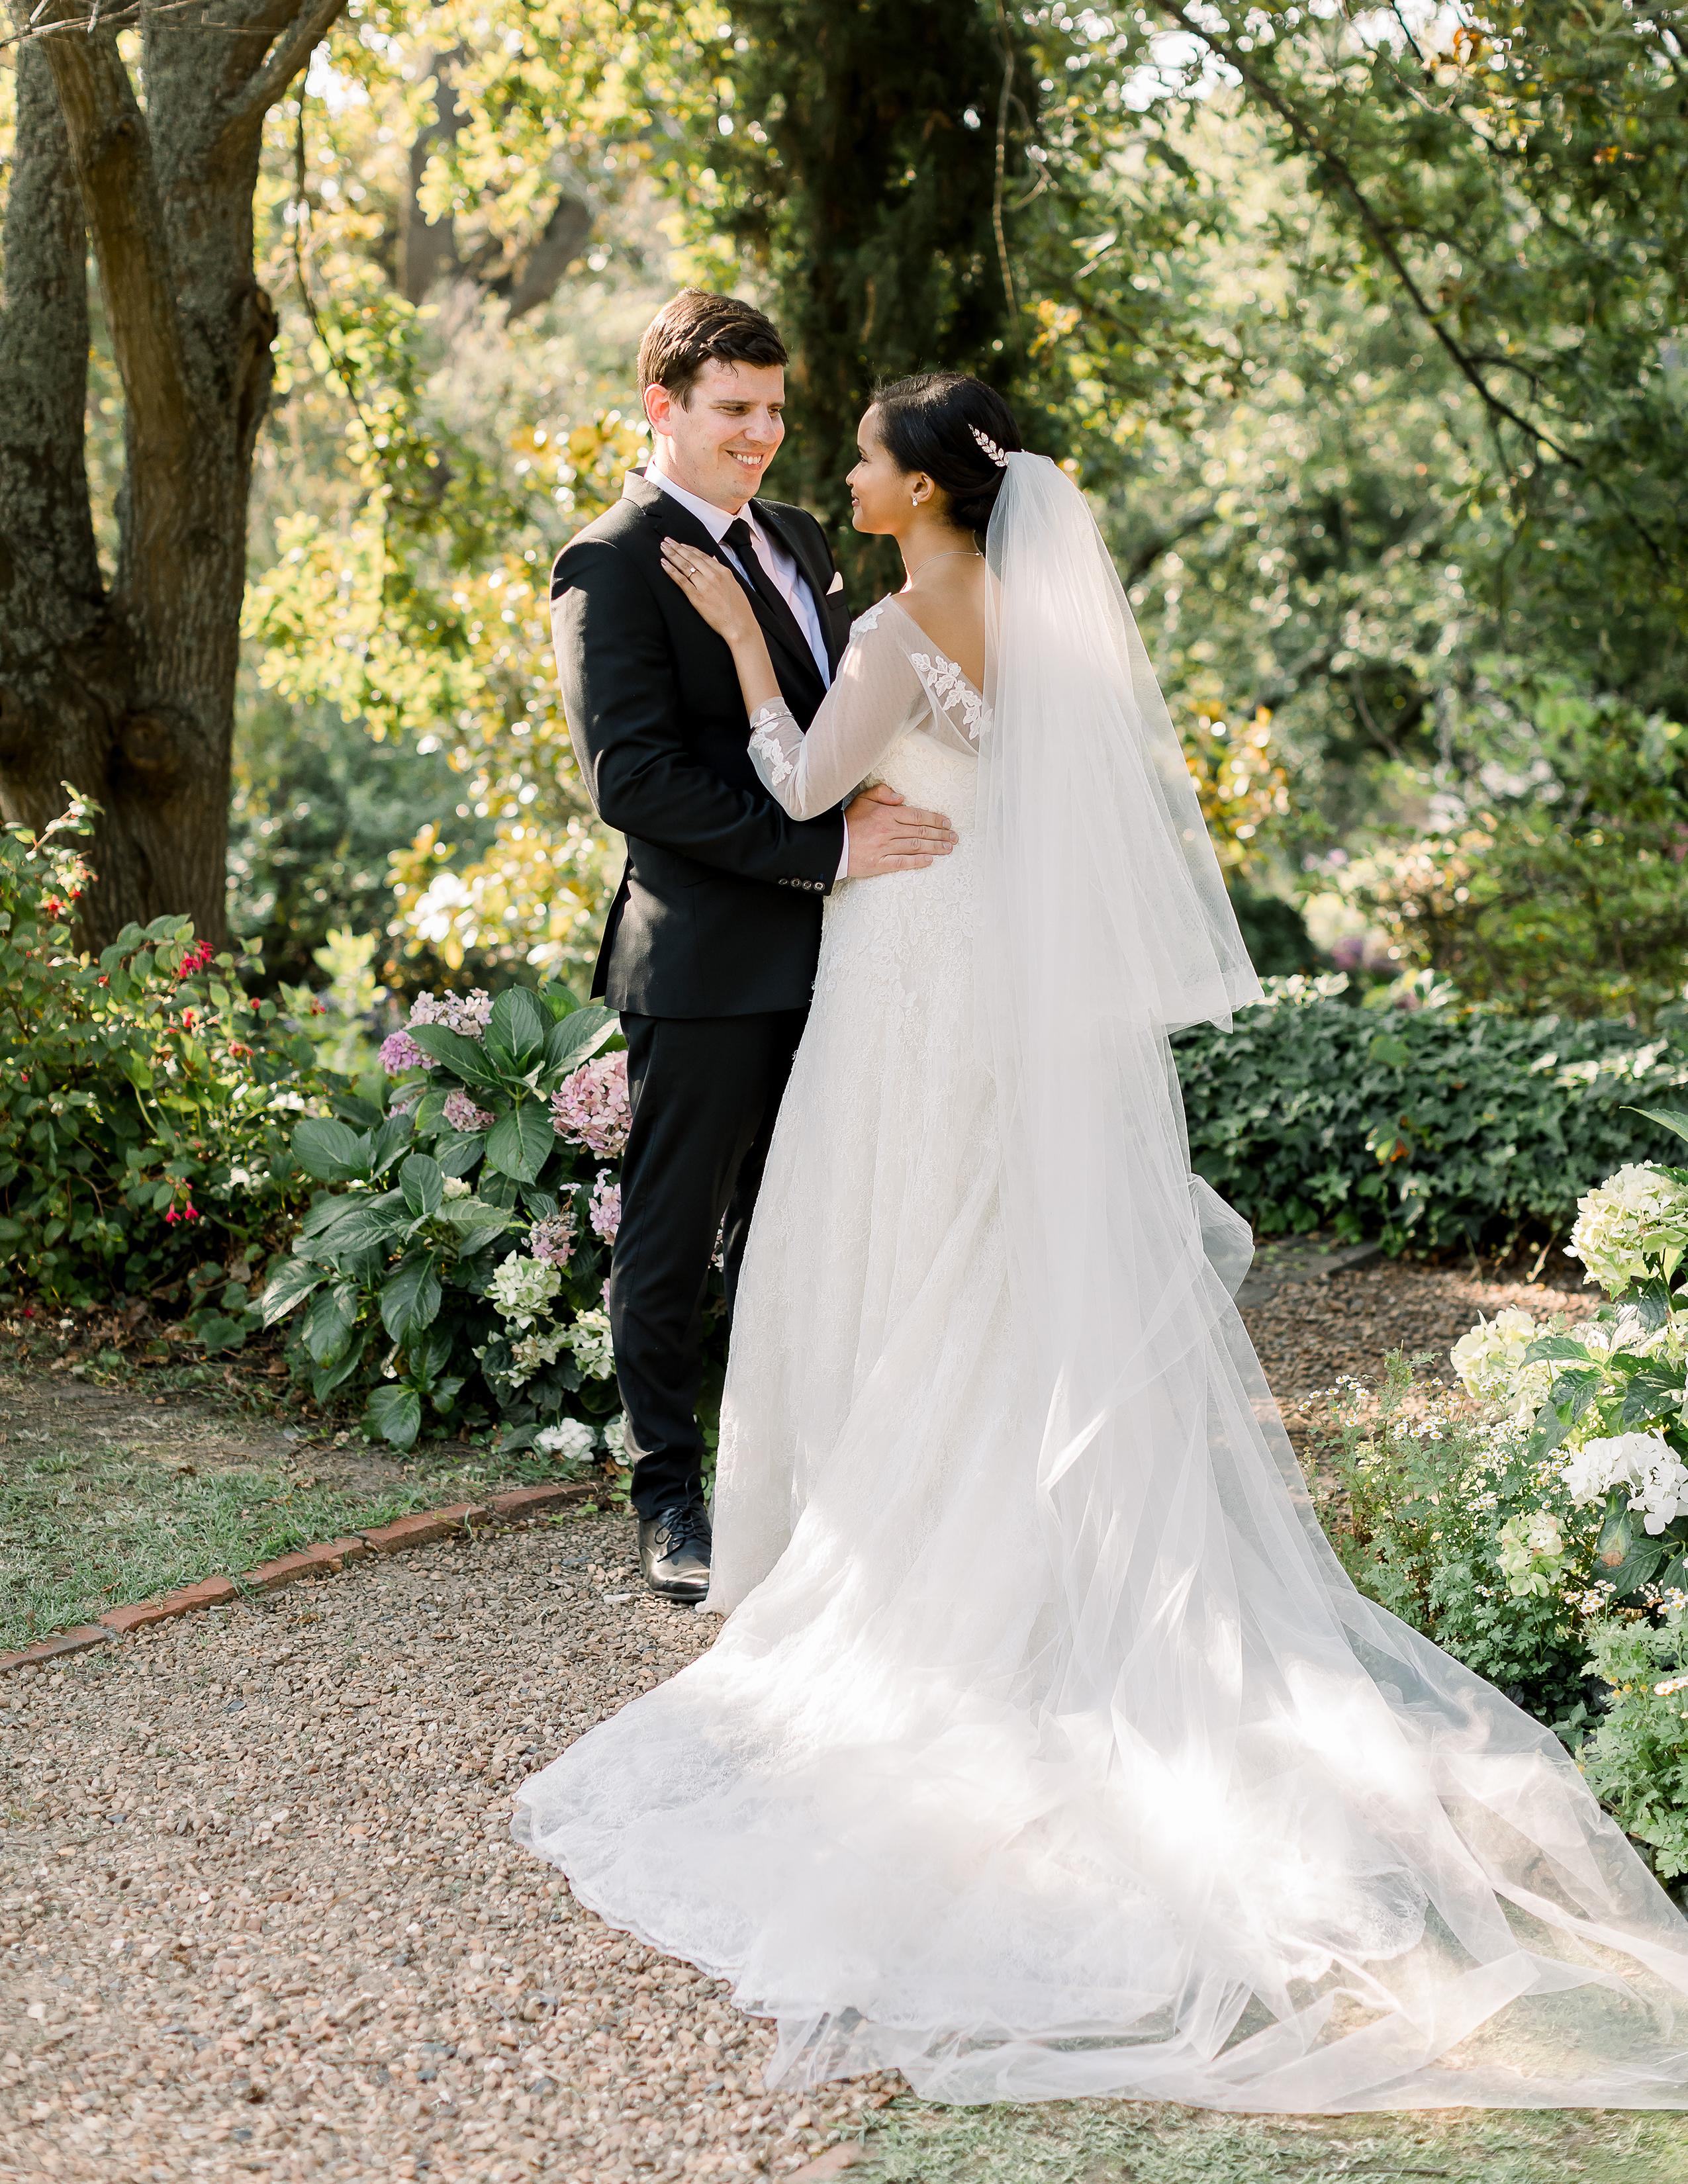 rorisang stephen wedding first look